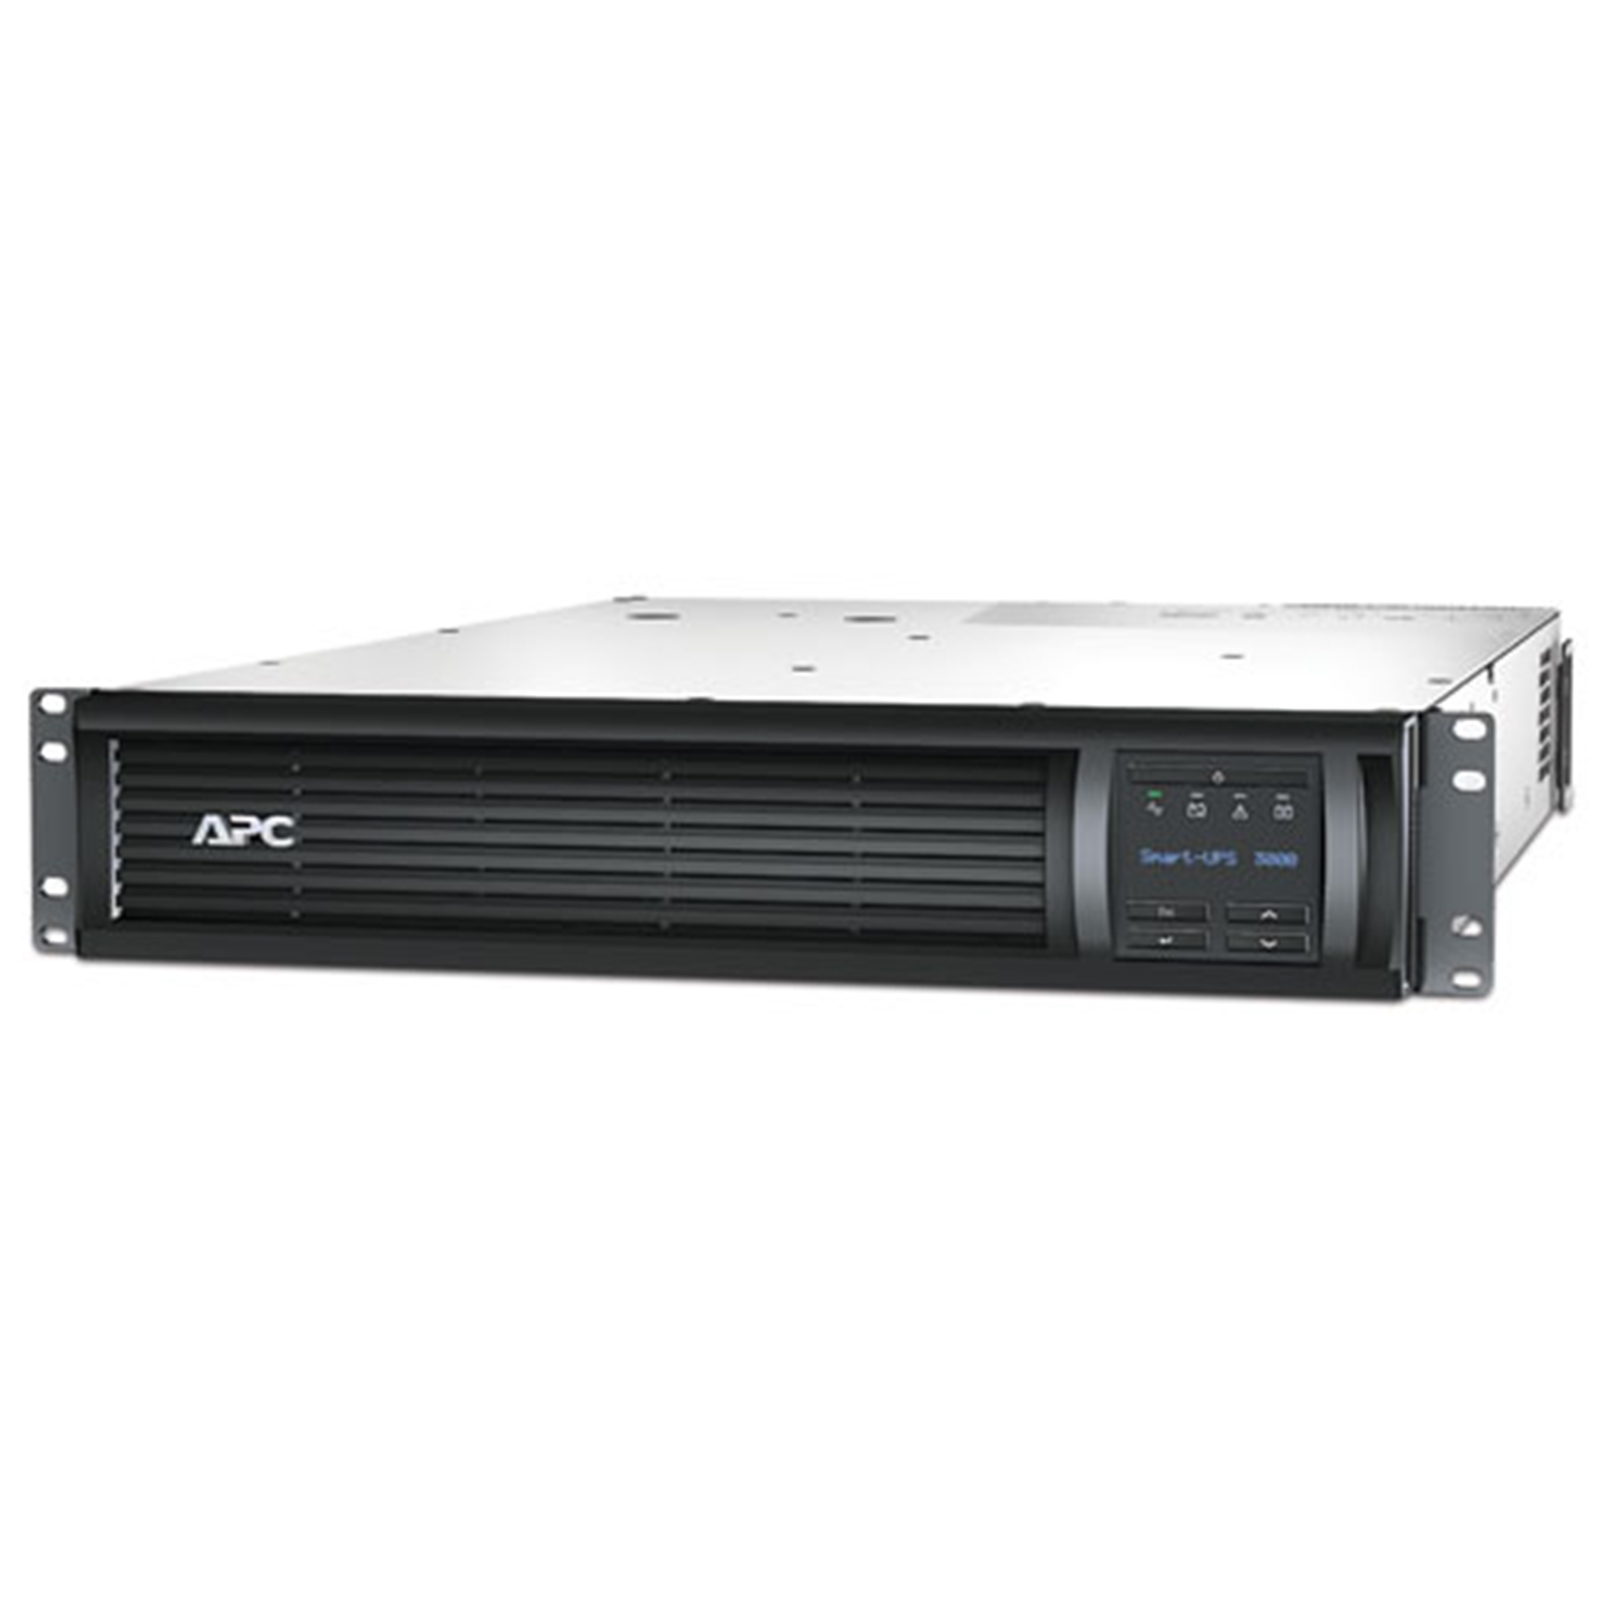 Apc Smart Ups 3000va Lcd Rm 2u 230v Smt3000rmi2u Serversplus